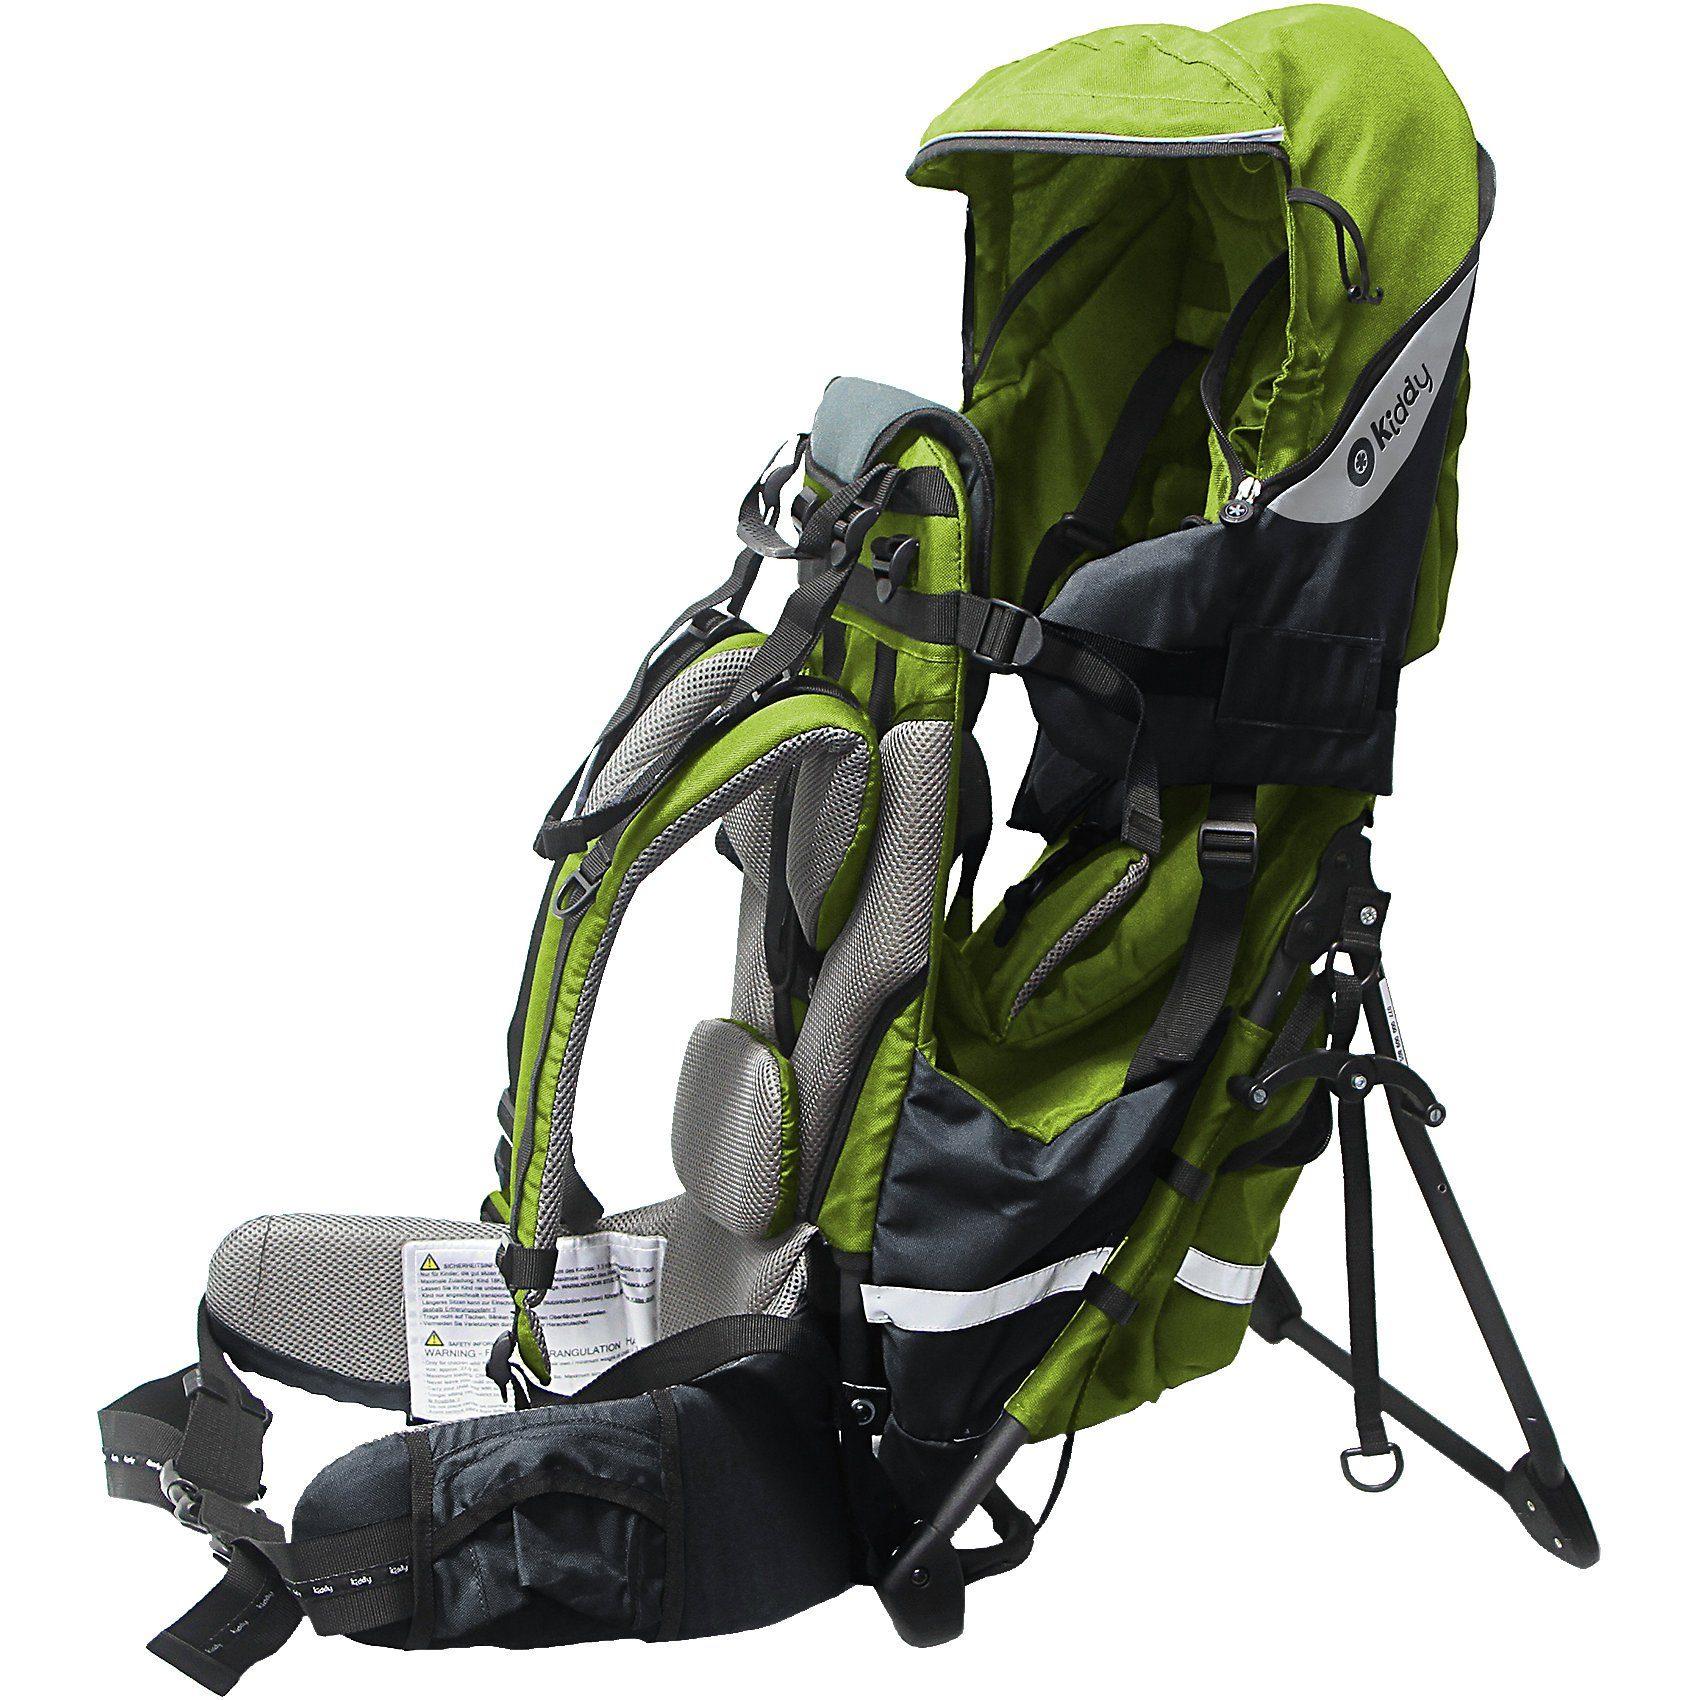 kiddy Rückentrage Adventure Pack, lime green, 2017